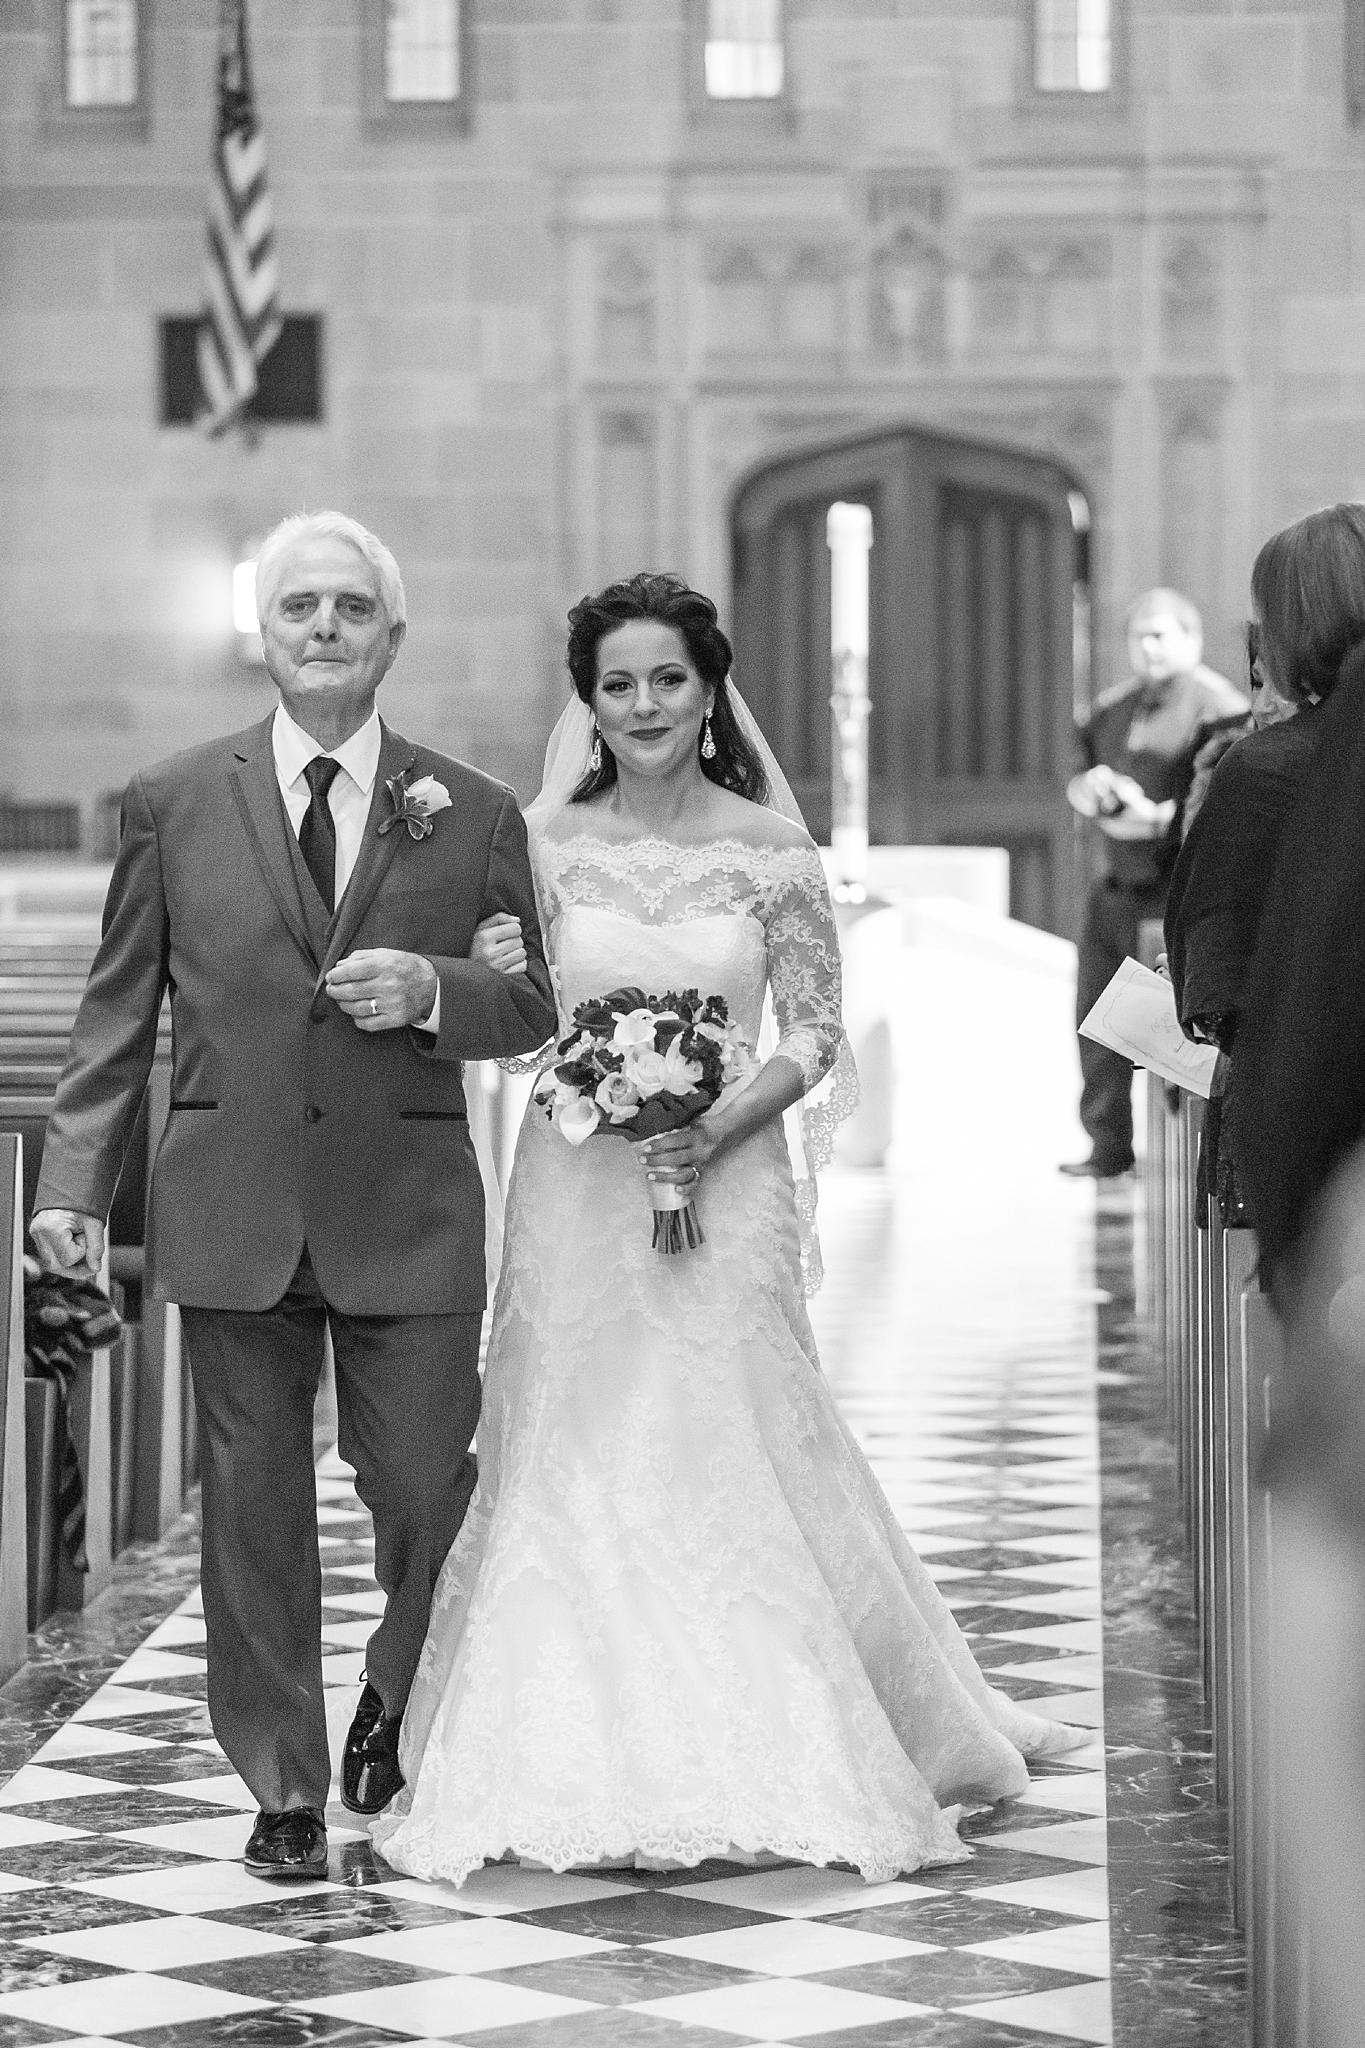 detroit-colony-club-wedding-regal-romantic-photography-in-detroit-mi-by-courtney-carolyn-photography_0023.jpg